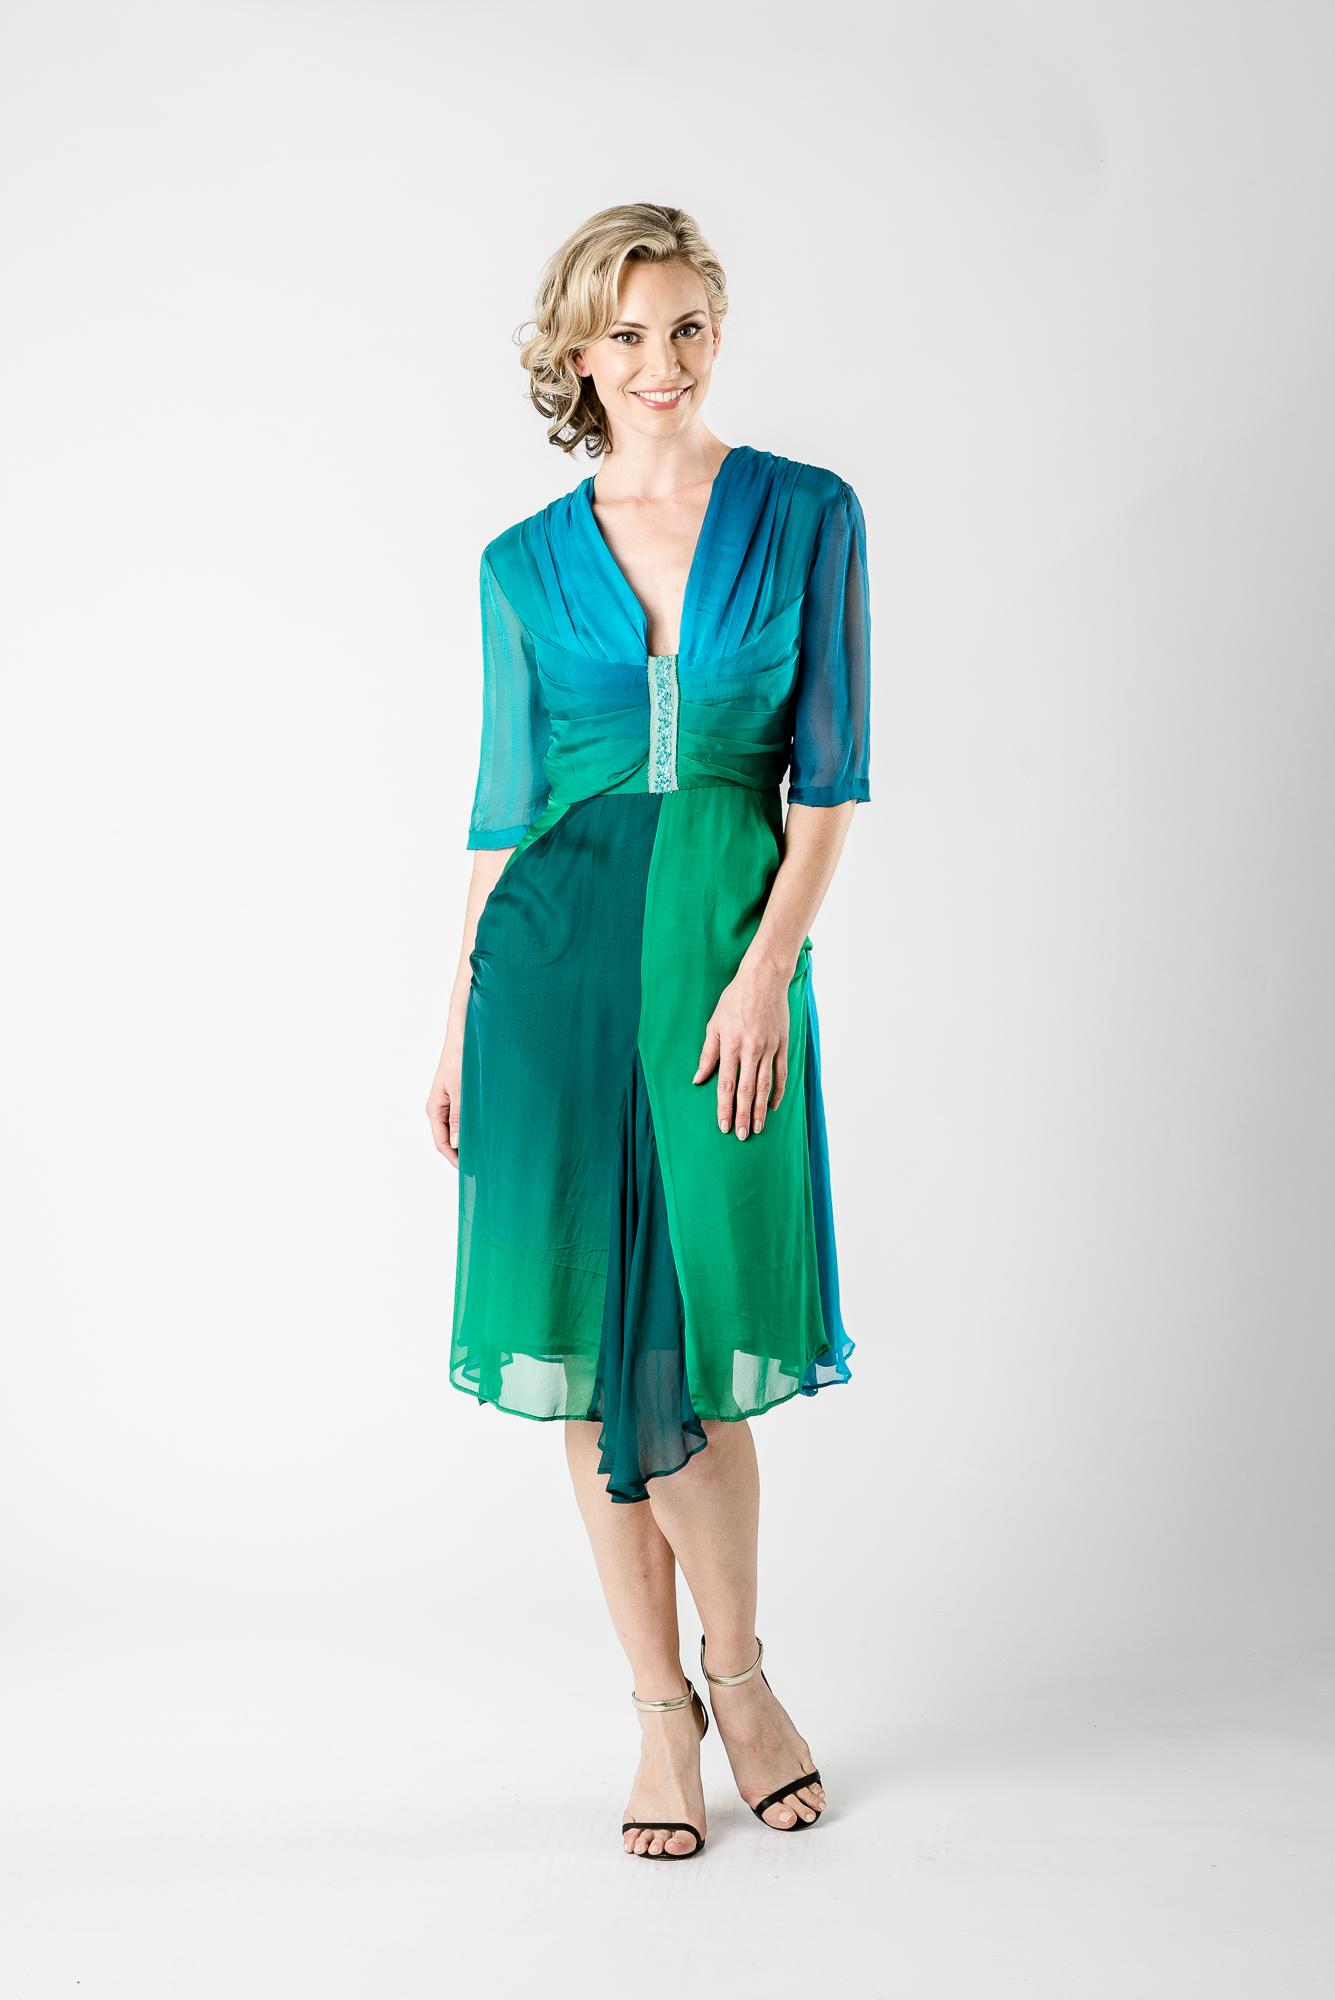 Fashion360 fashion 360 news events pics and gossip Australian green fashion designers